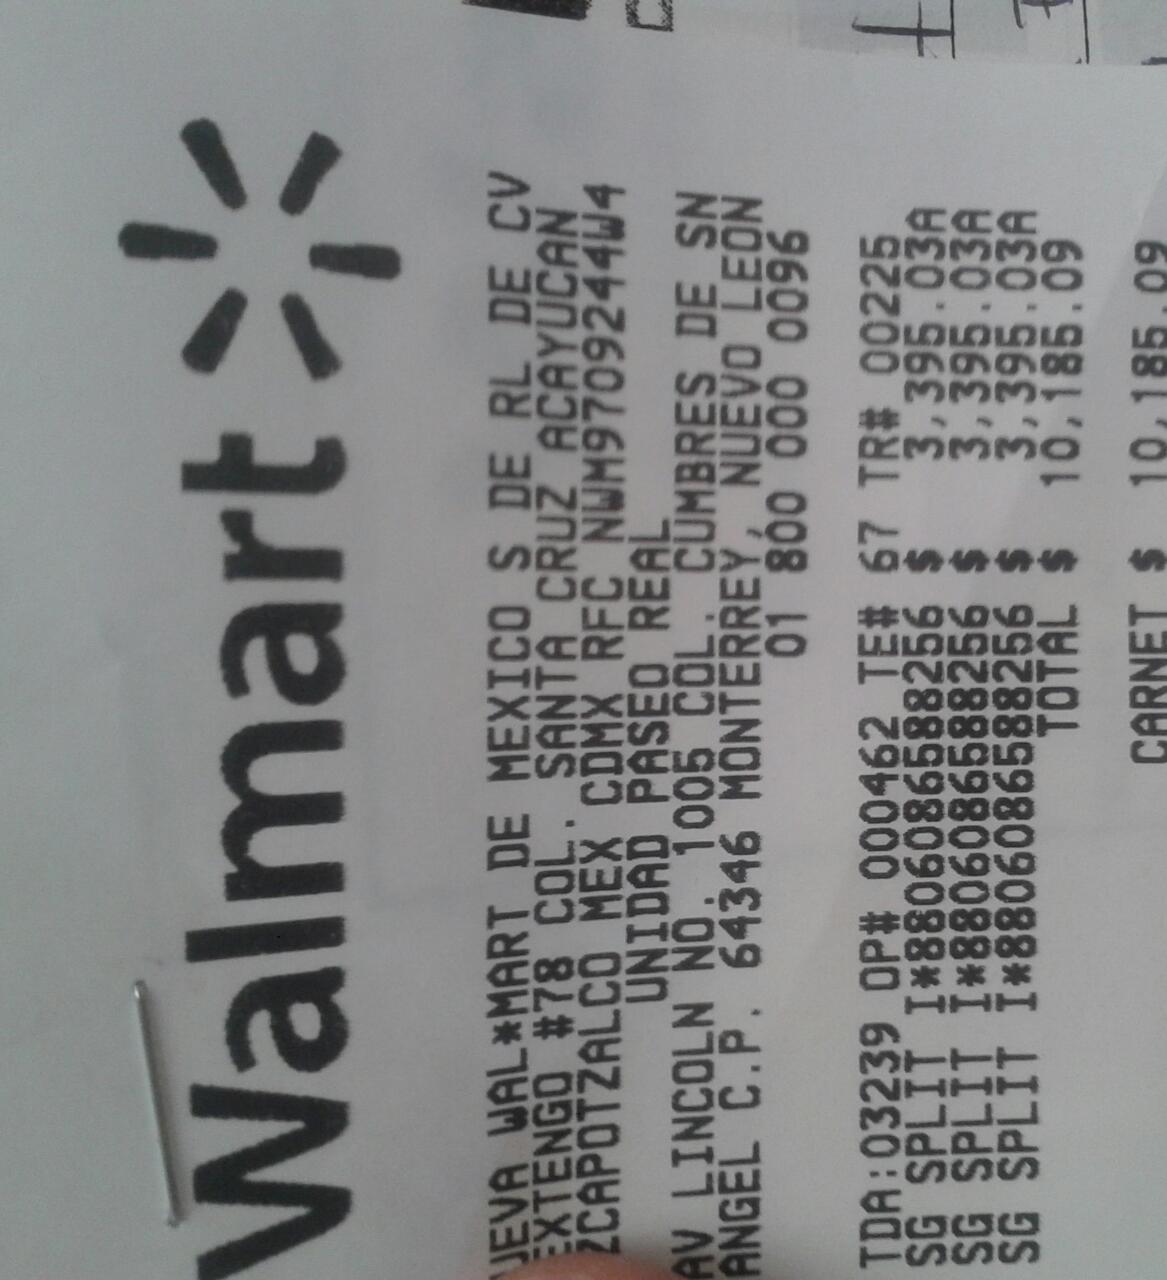 Walmart Paseo Real monterrey: minisplit Samsung Inverter a $3,395.03